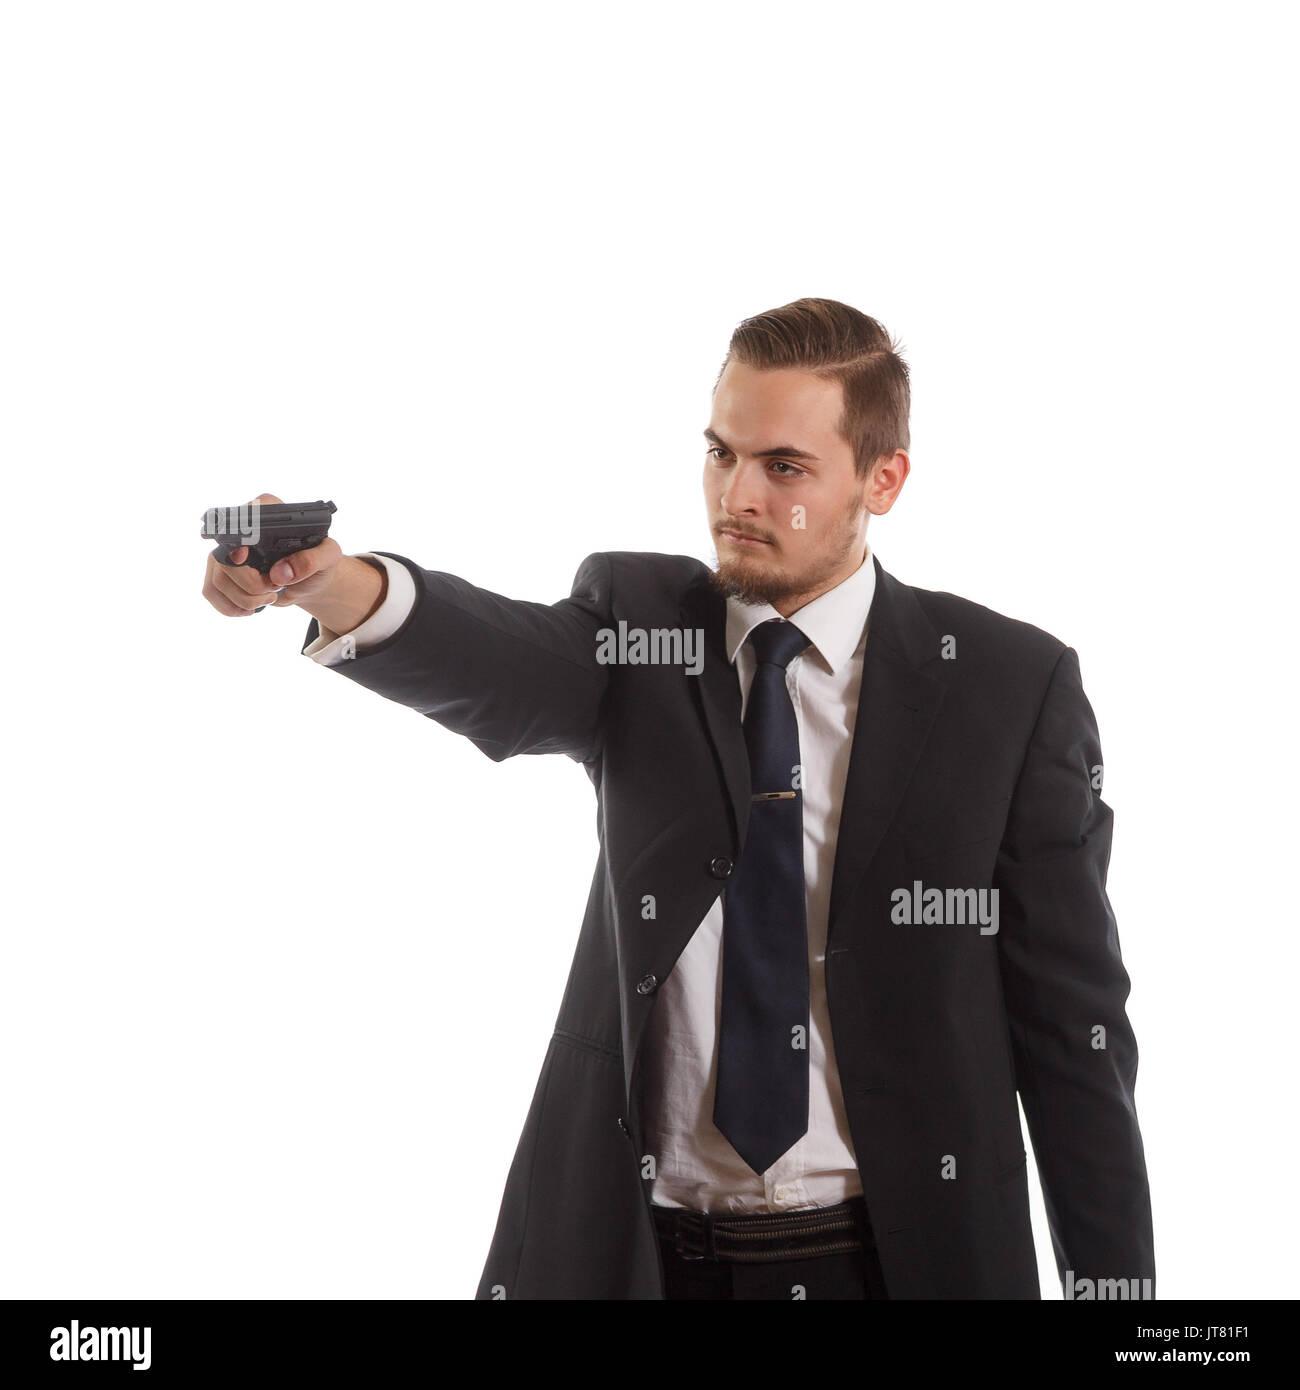 Man with a handgun - Stock Image